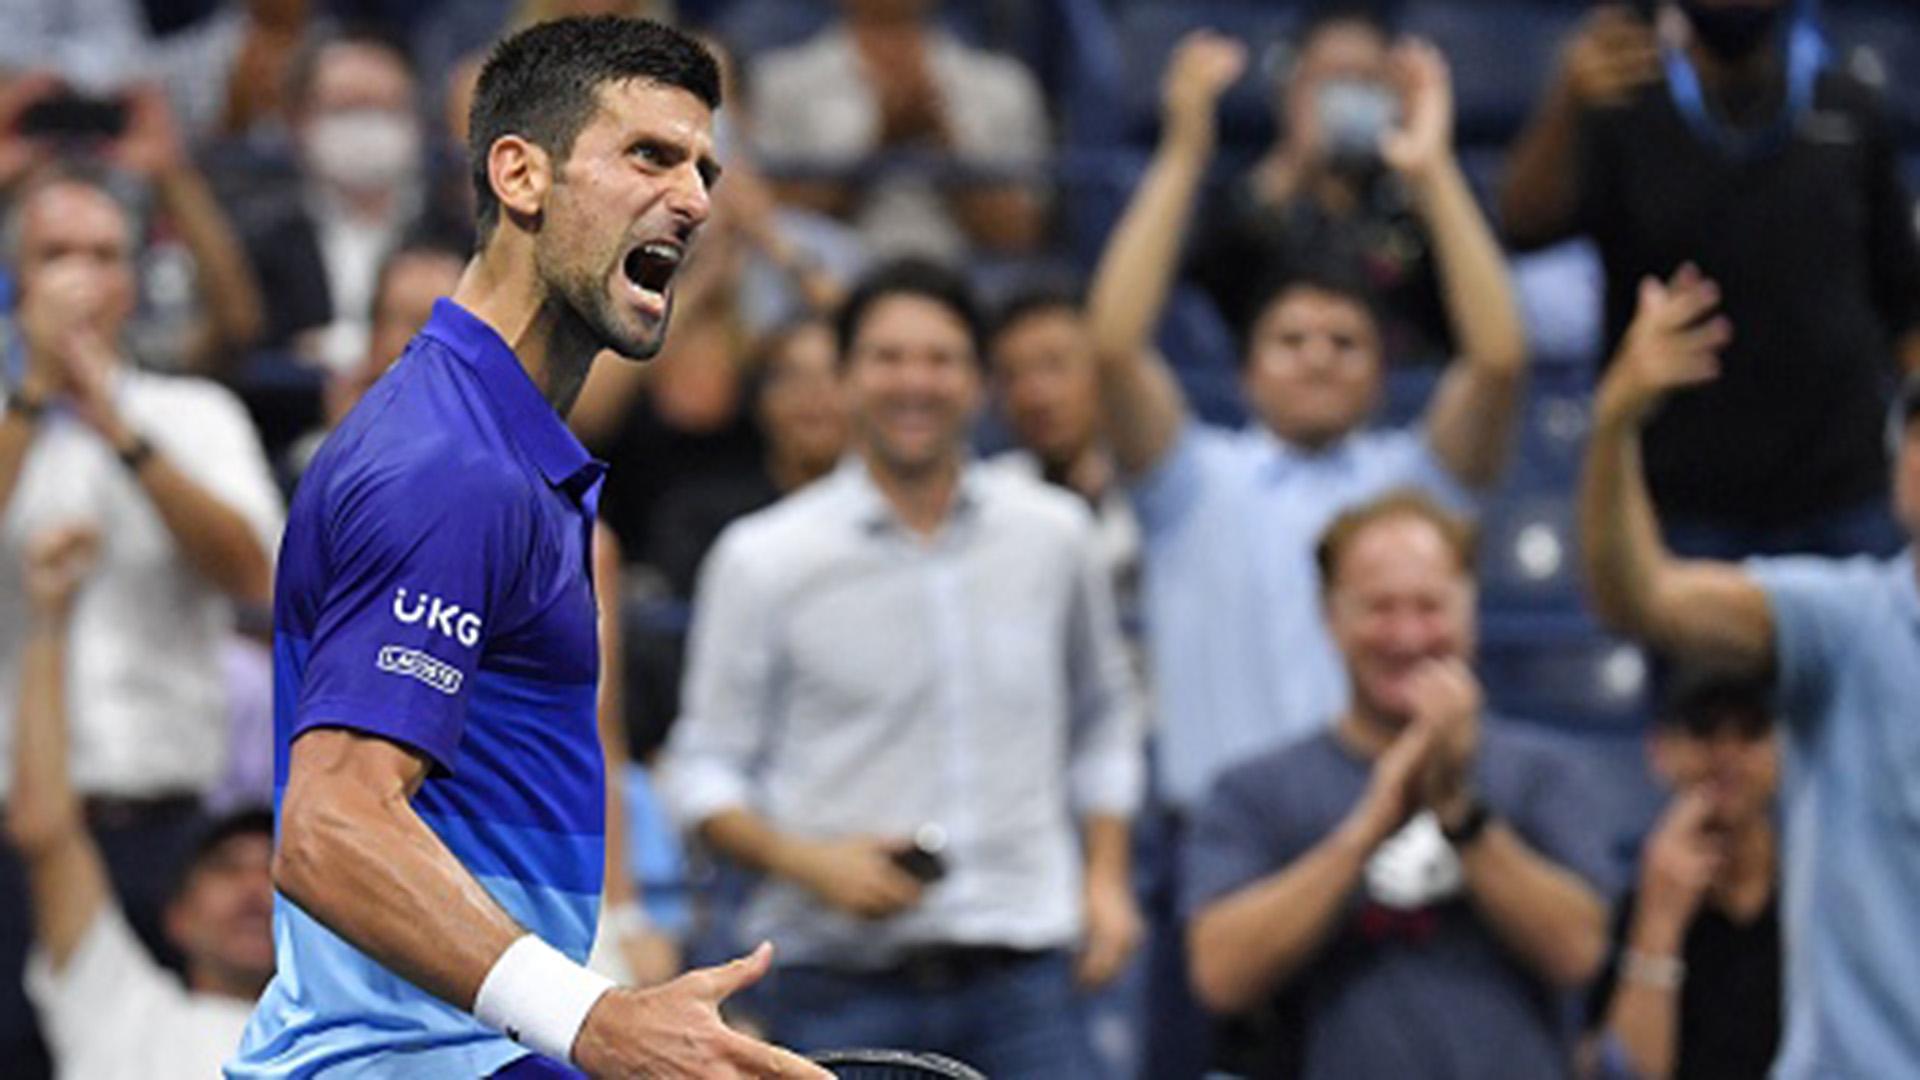 Djokovic tops Berrettini in US Open quarters to close in on slam - TSN